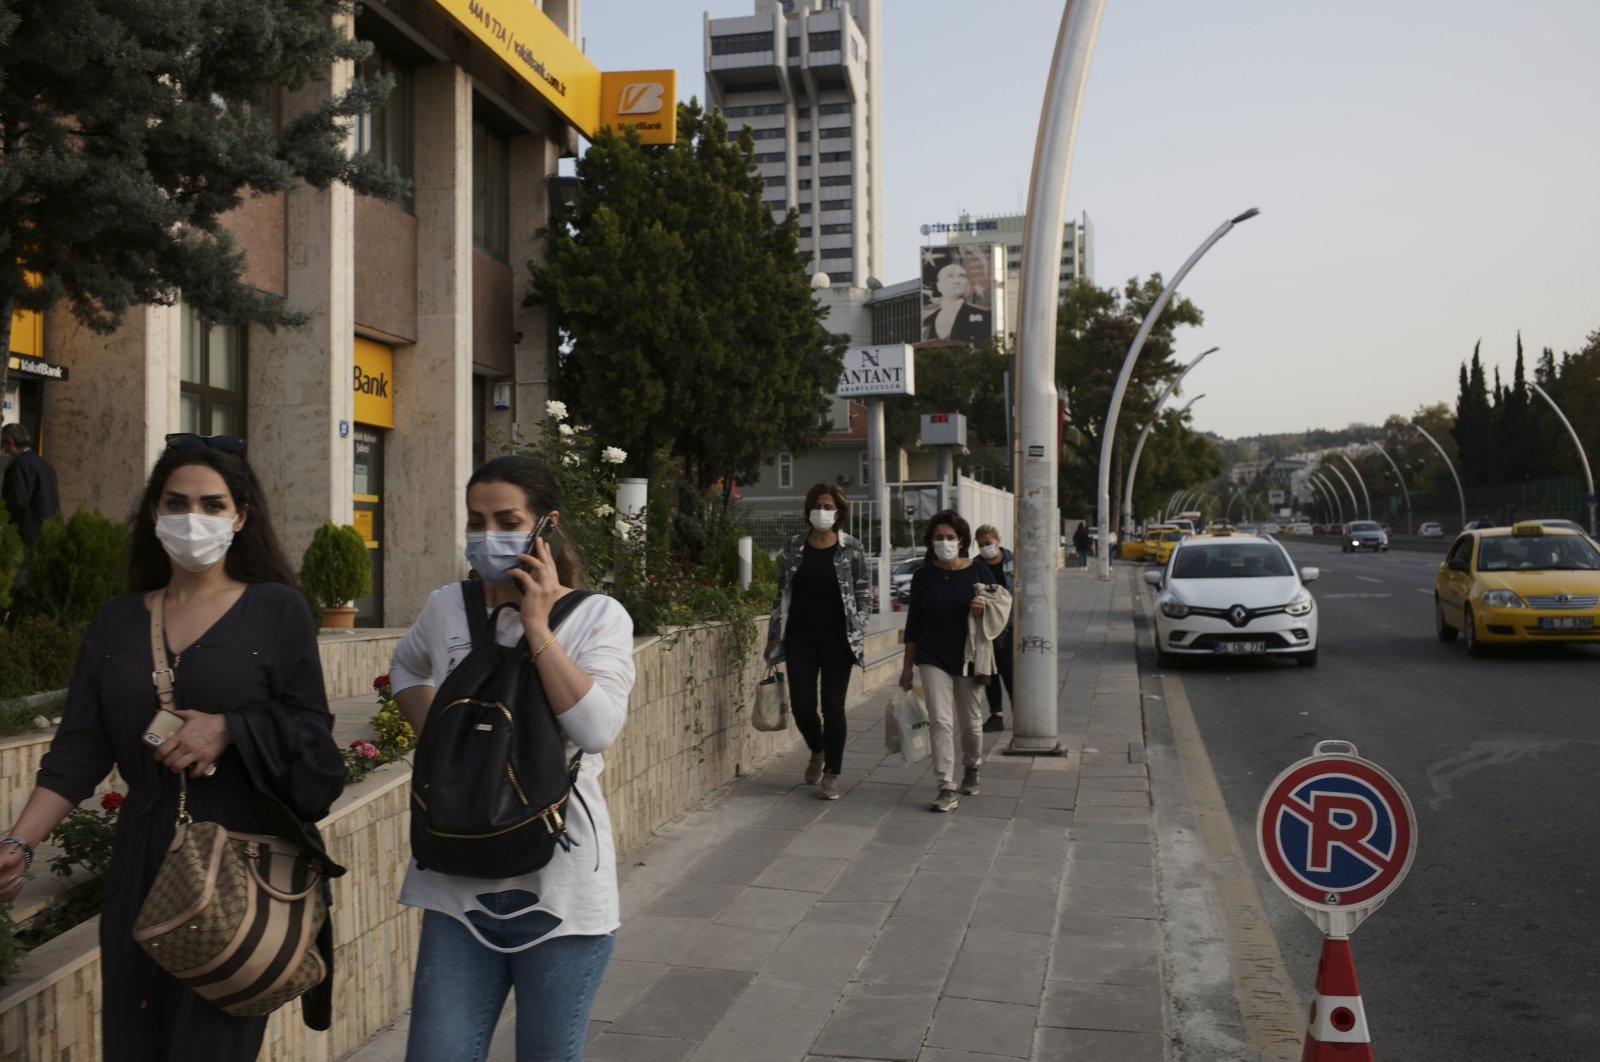 People wearing masks against the coronavirus, in the capital Ankara, Turkey, Oct. 27, 2020. (AP Photo)